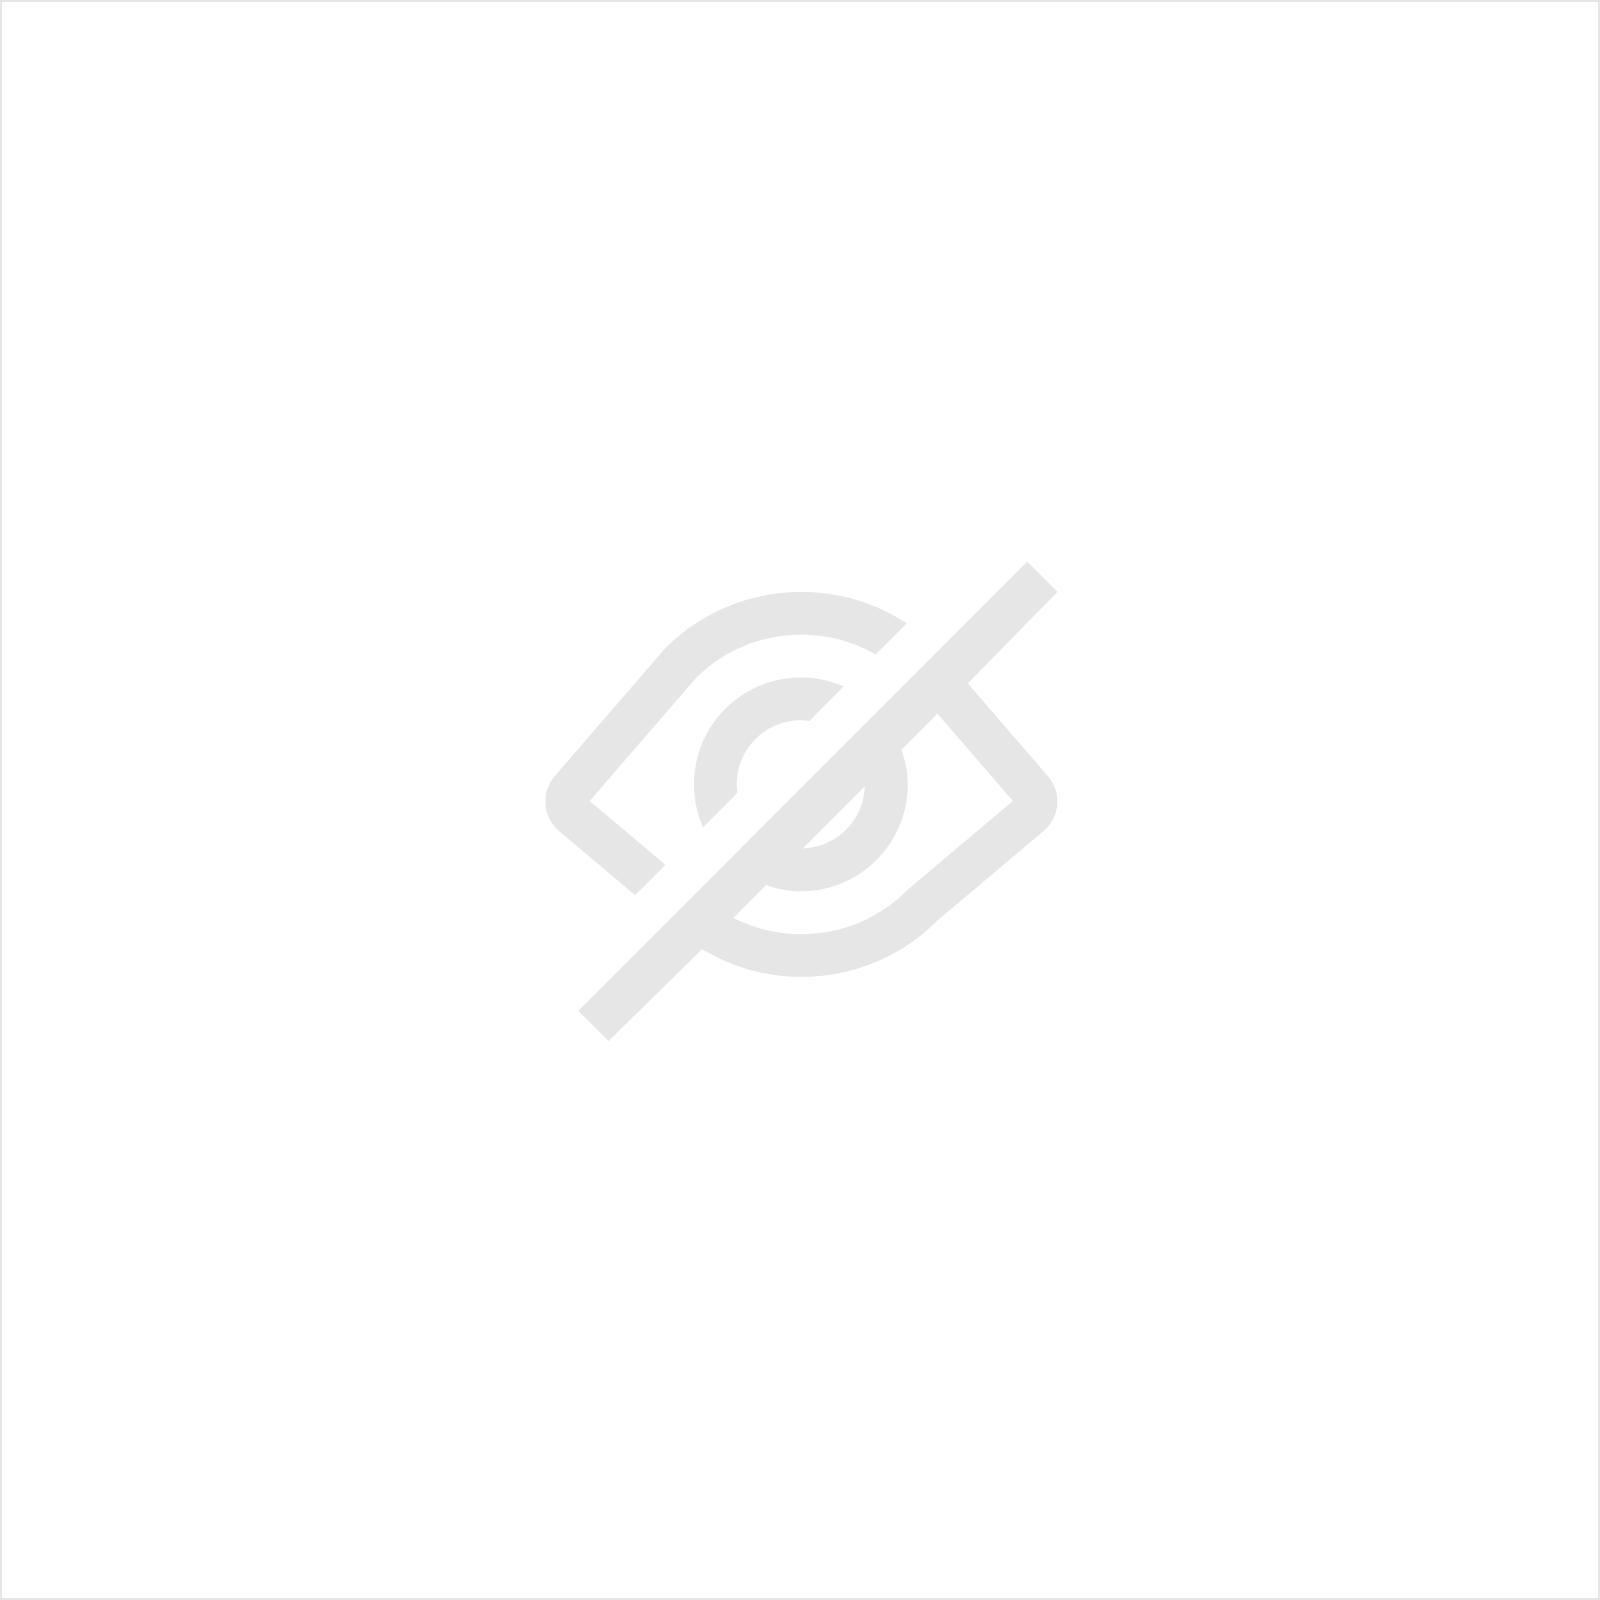 TELWIN PUNTLASAPPARAAT DIGITAL MODULAR 230 - 230V